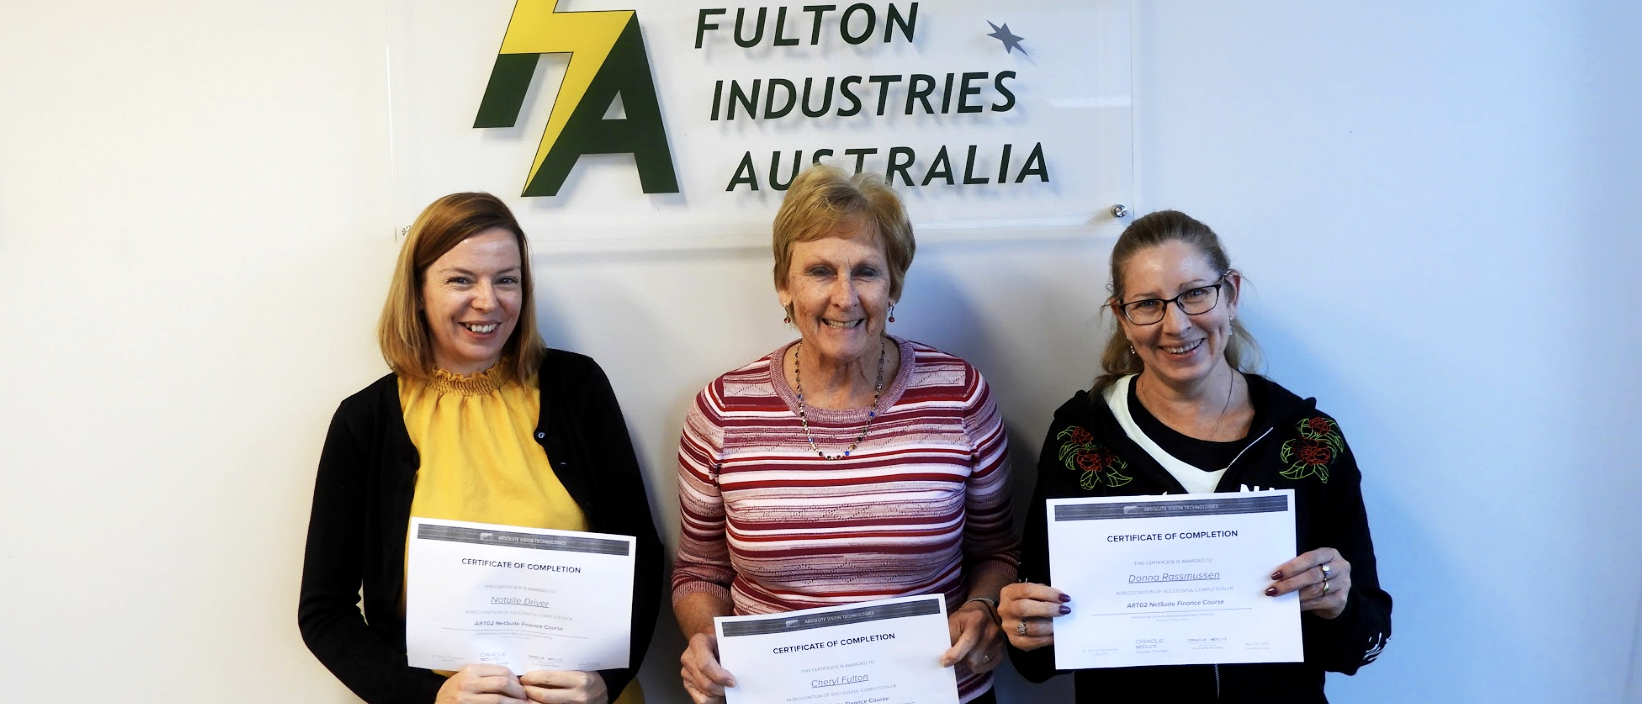 Fulton Industries Australia